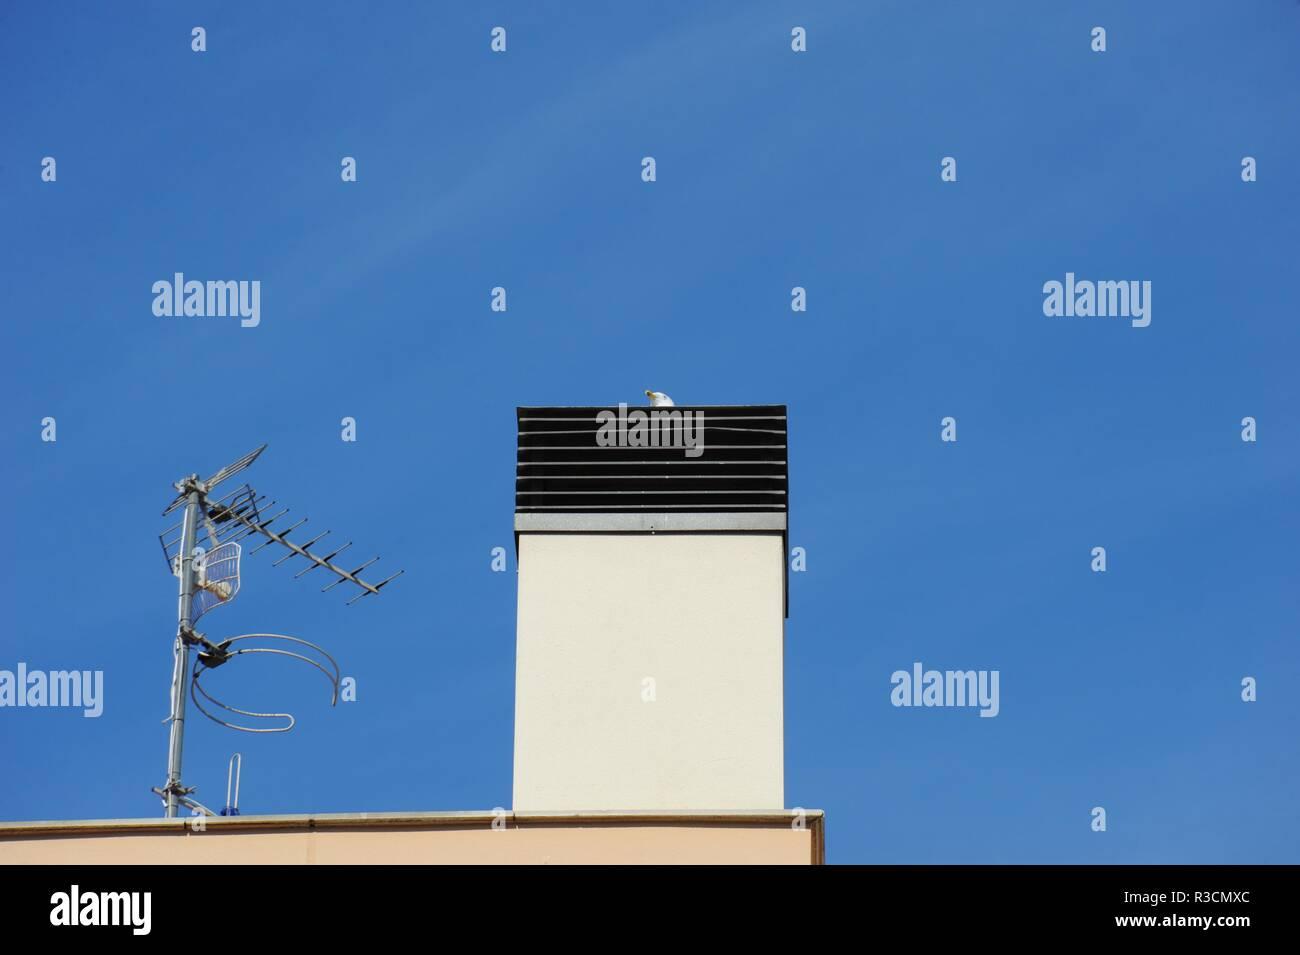 house facades in lloret de mar - costa brava - spain - Stock Image